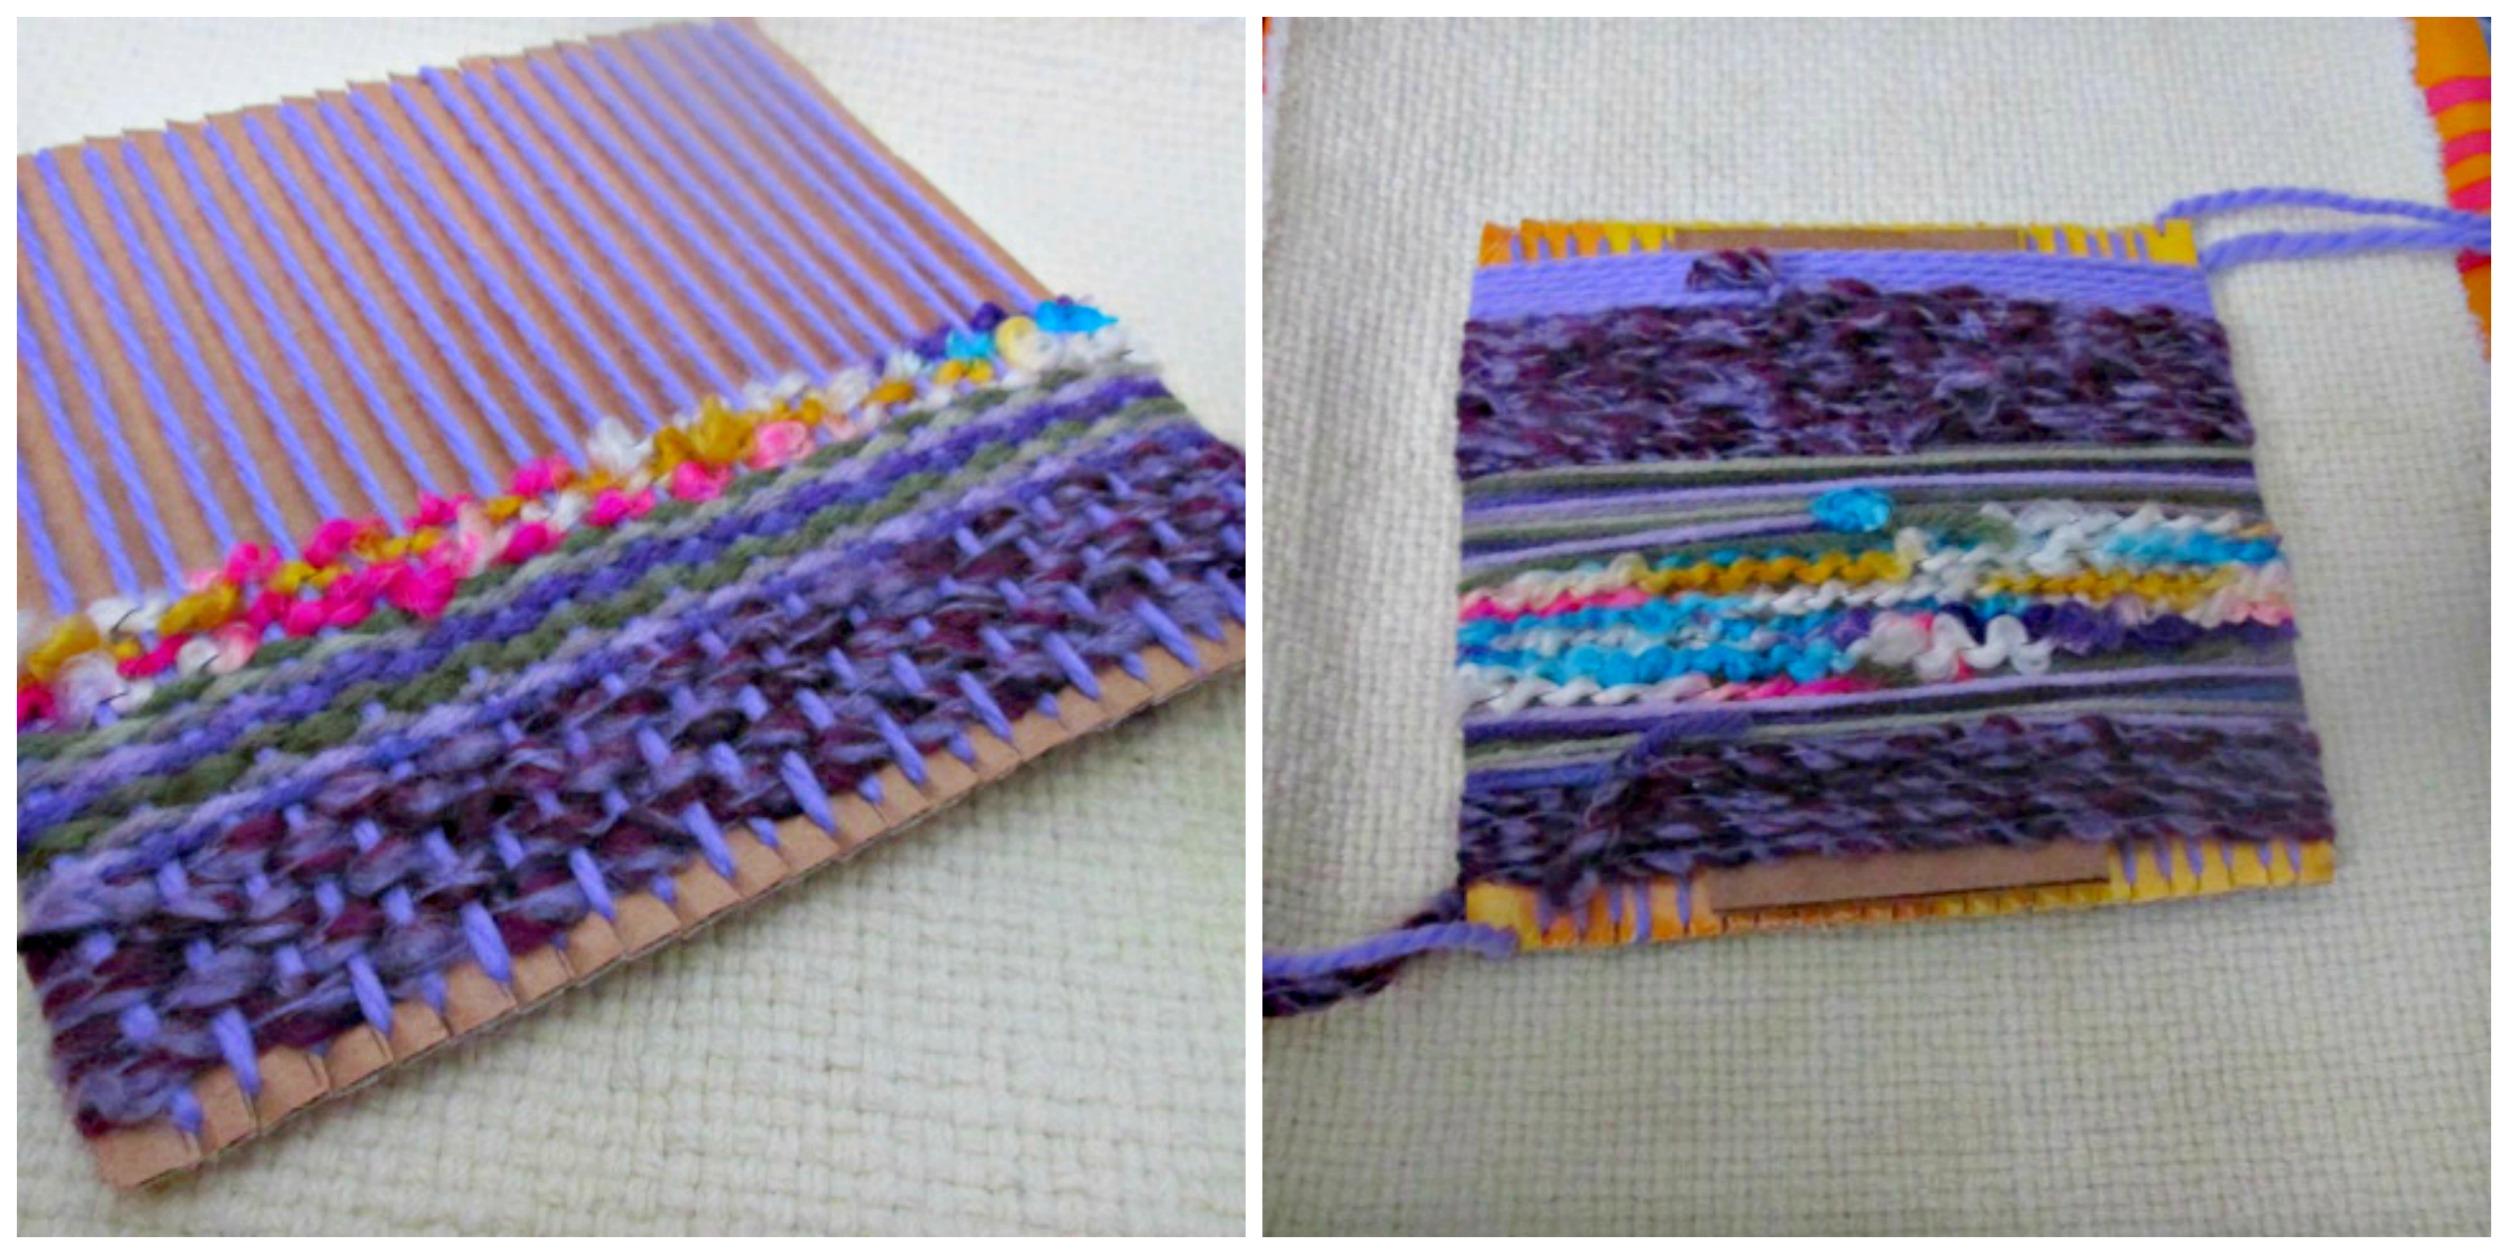 saori weaving technique